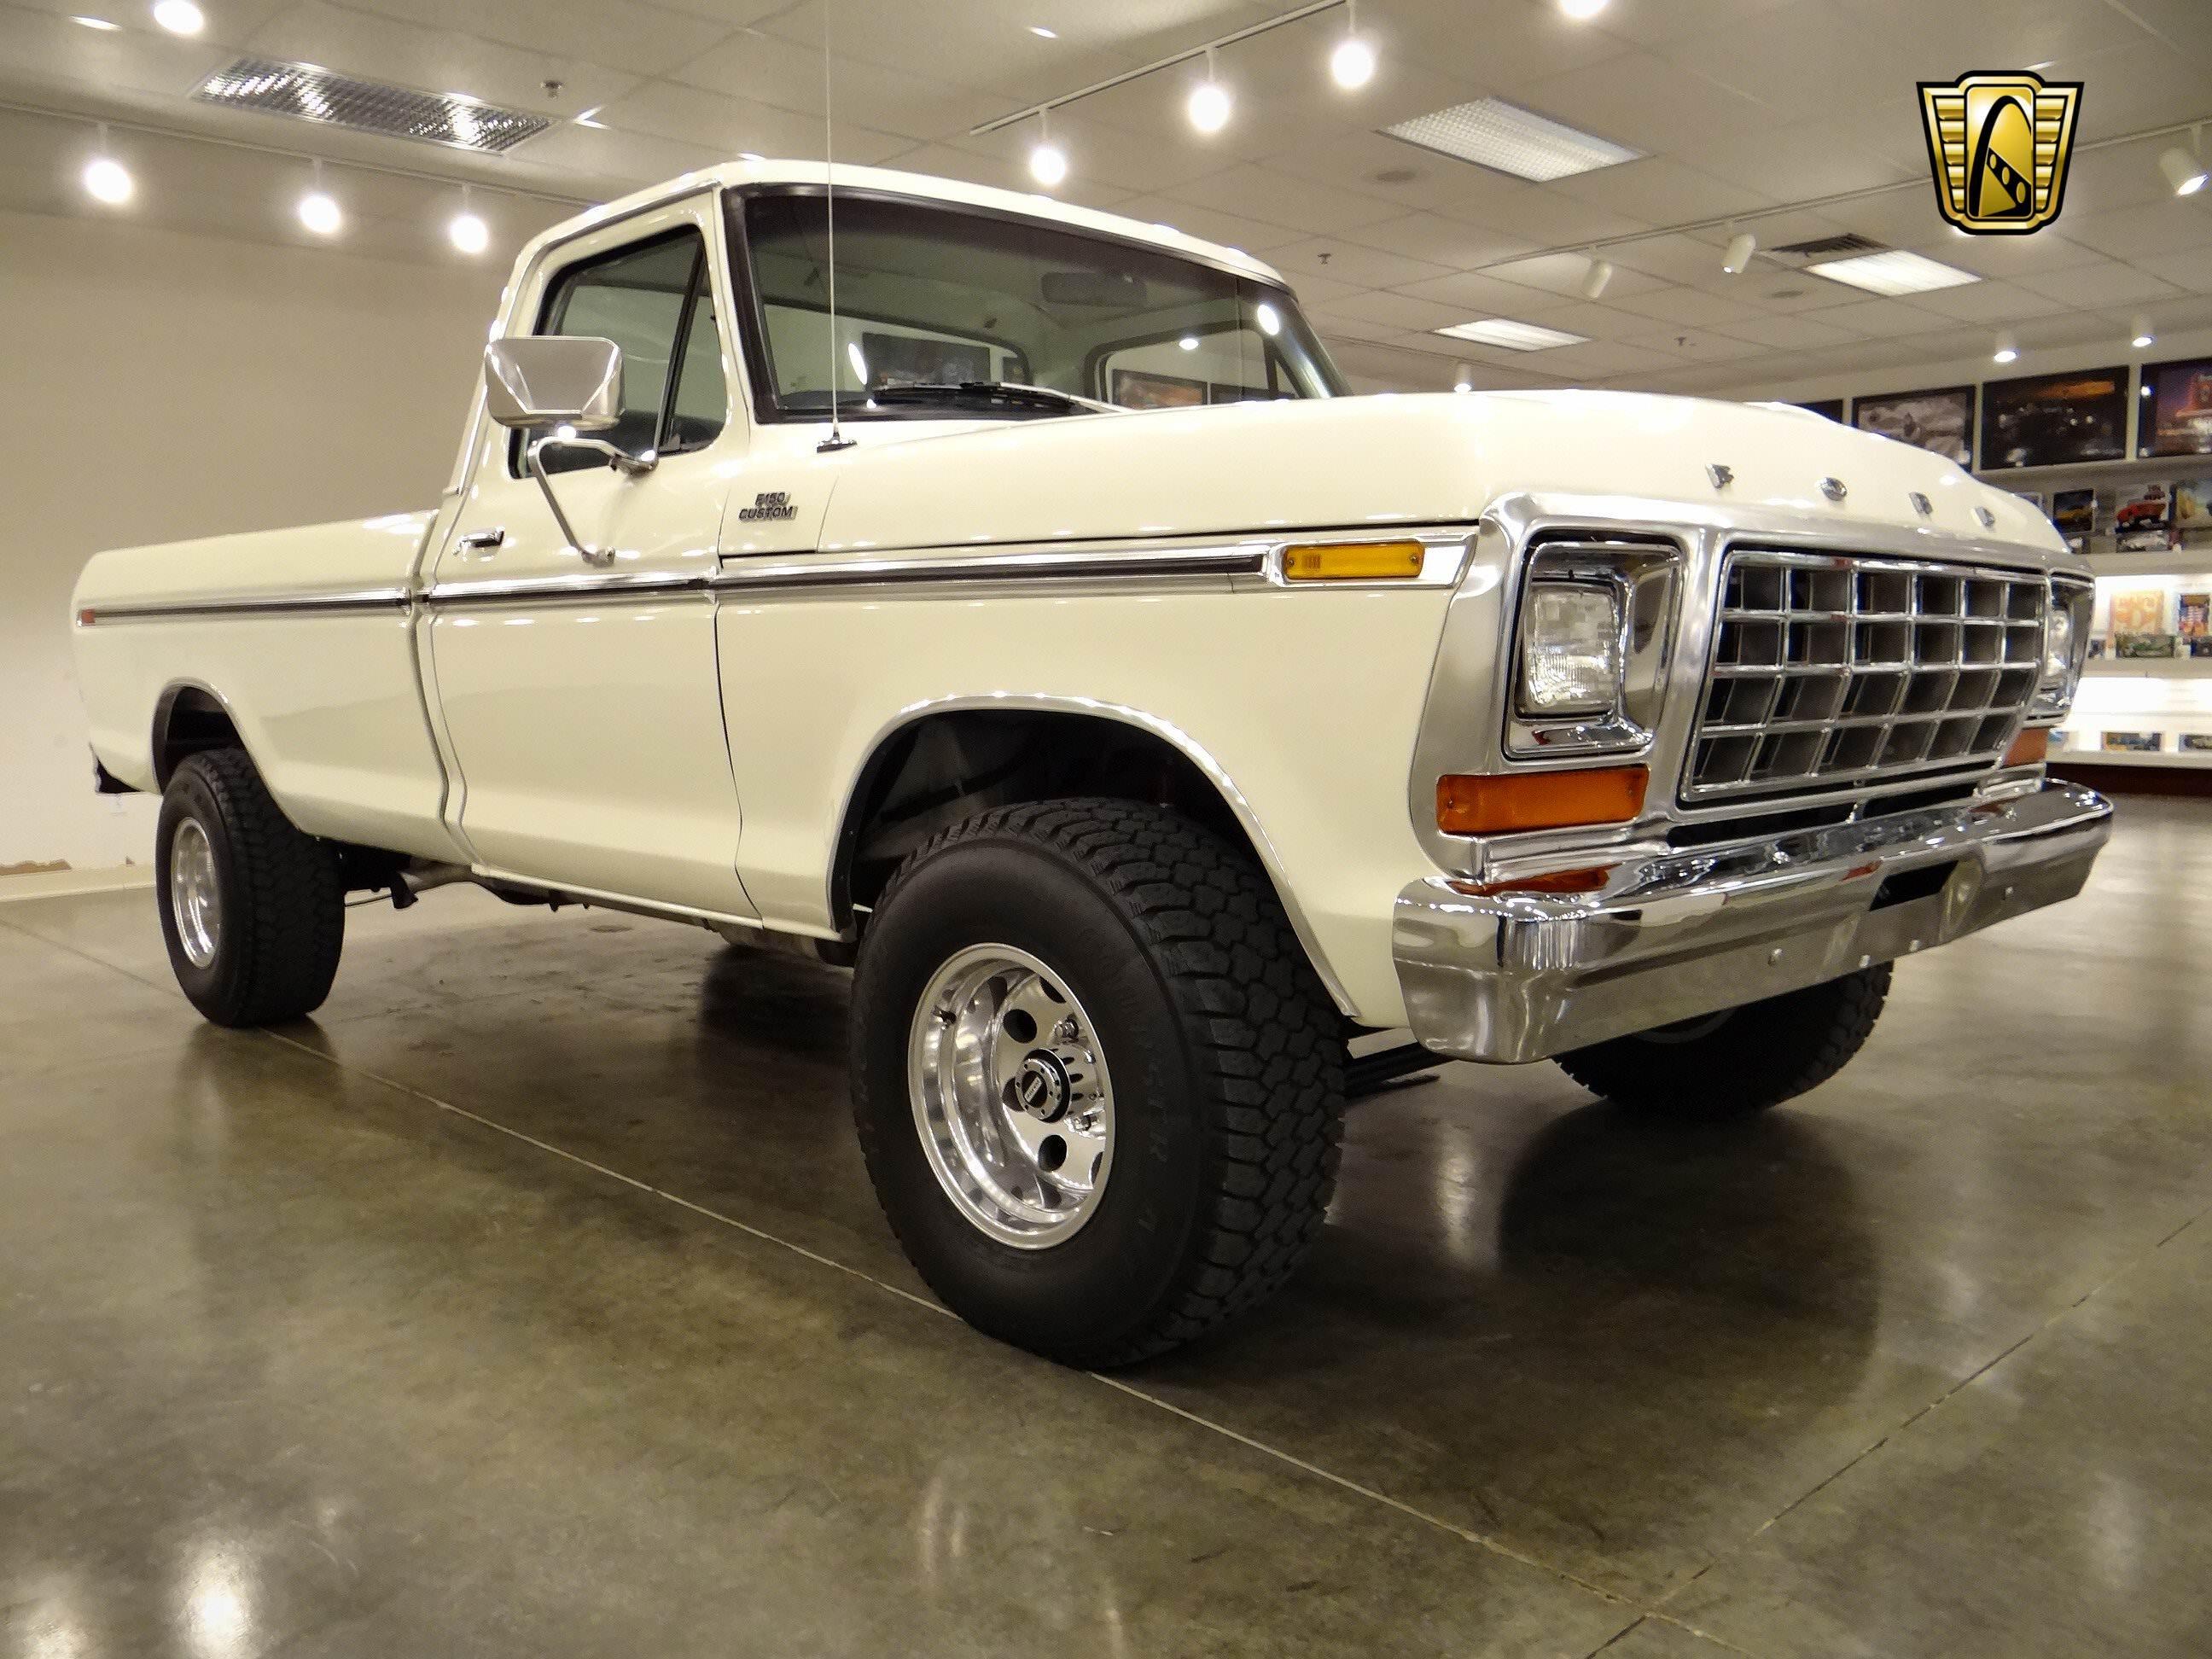 1979 Ford F150 4x4 pickup 22 wallpaper background 2592x1944